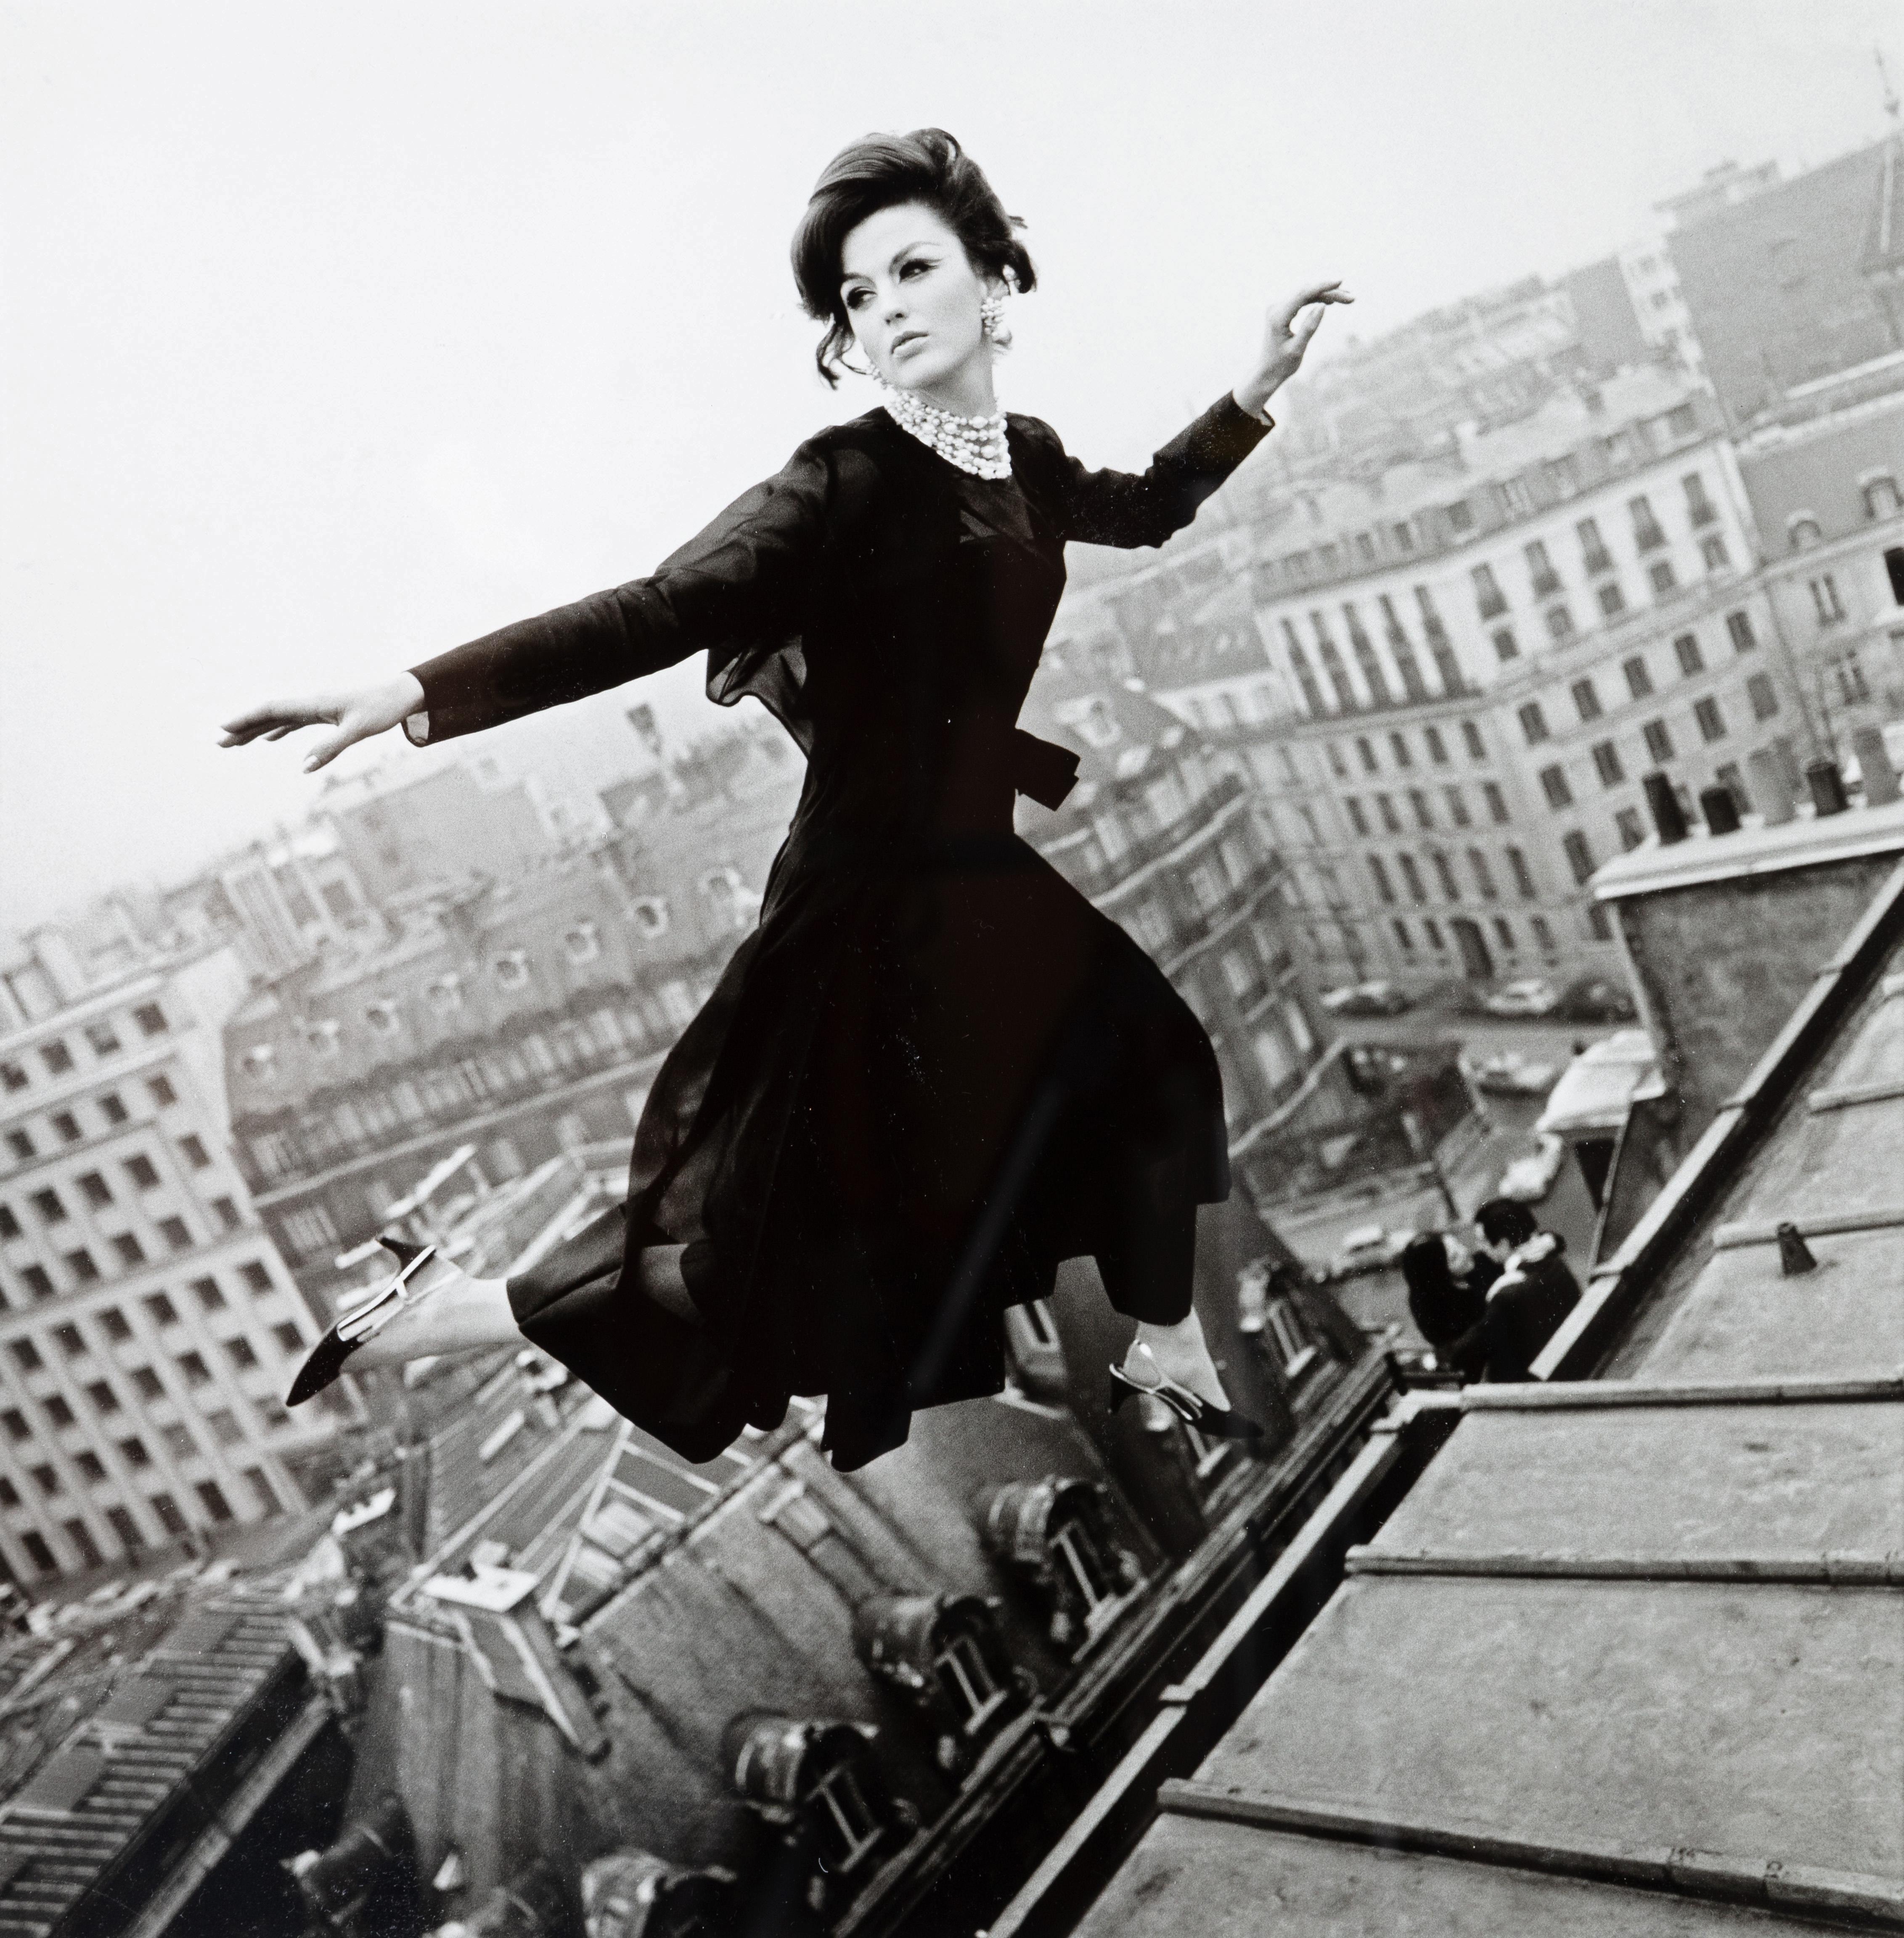 View full screen - View 1 of Lot 3. MELVIN SOKOLSKY   'FLY DIOR', PARIS, 1965.